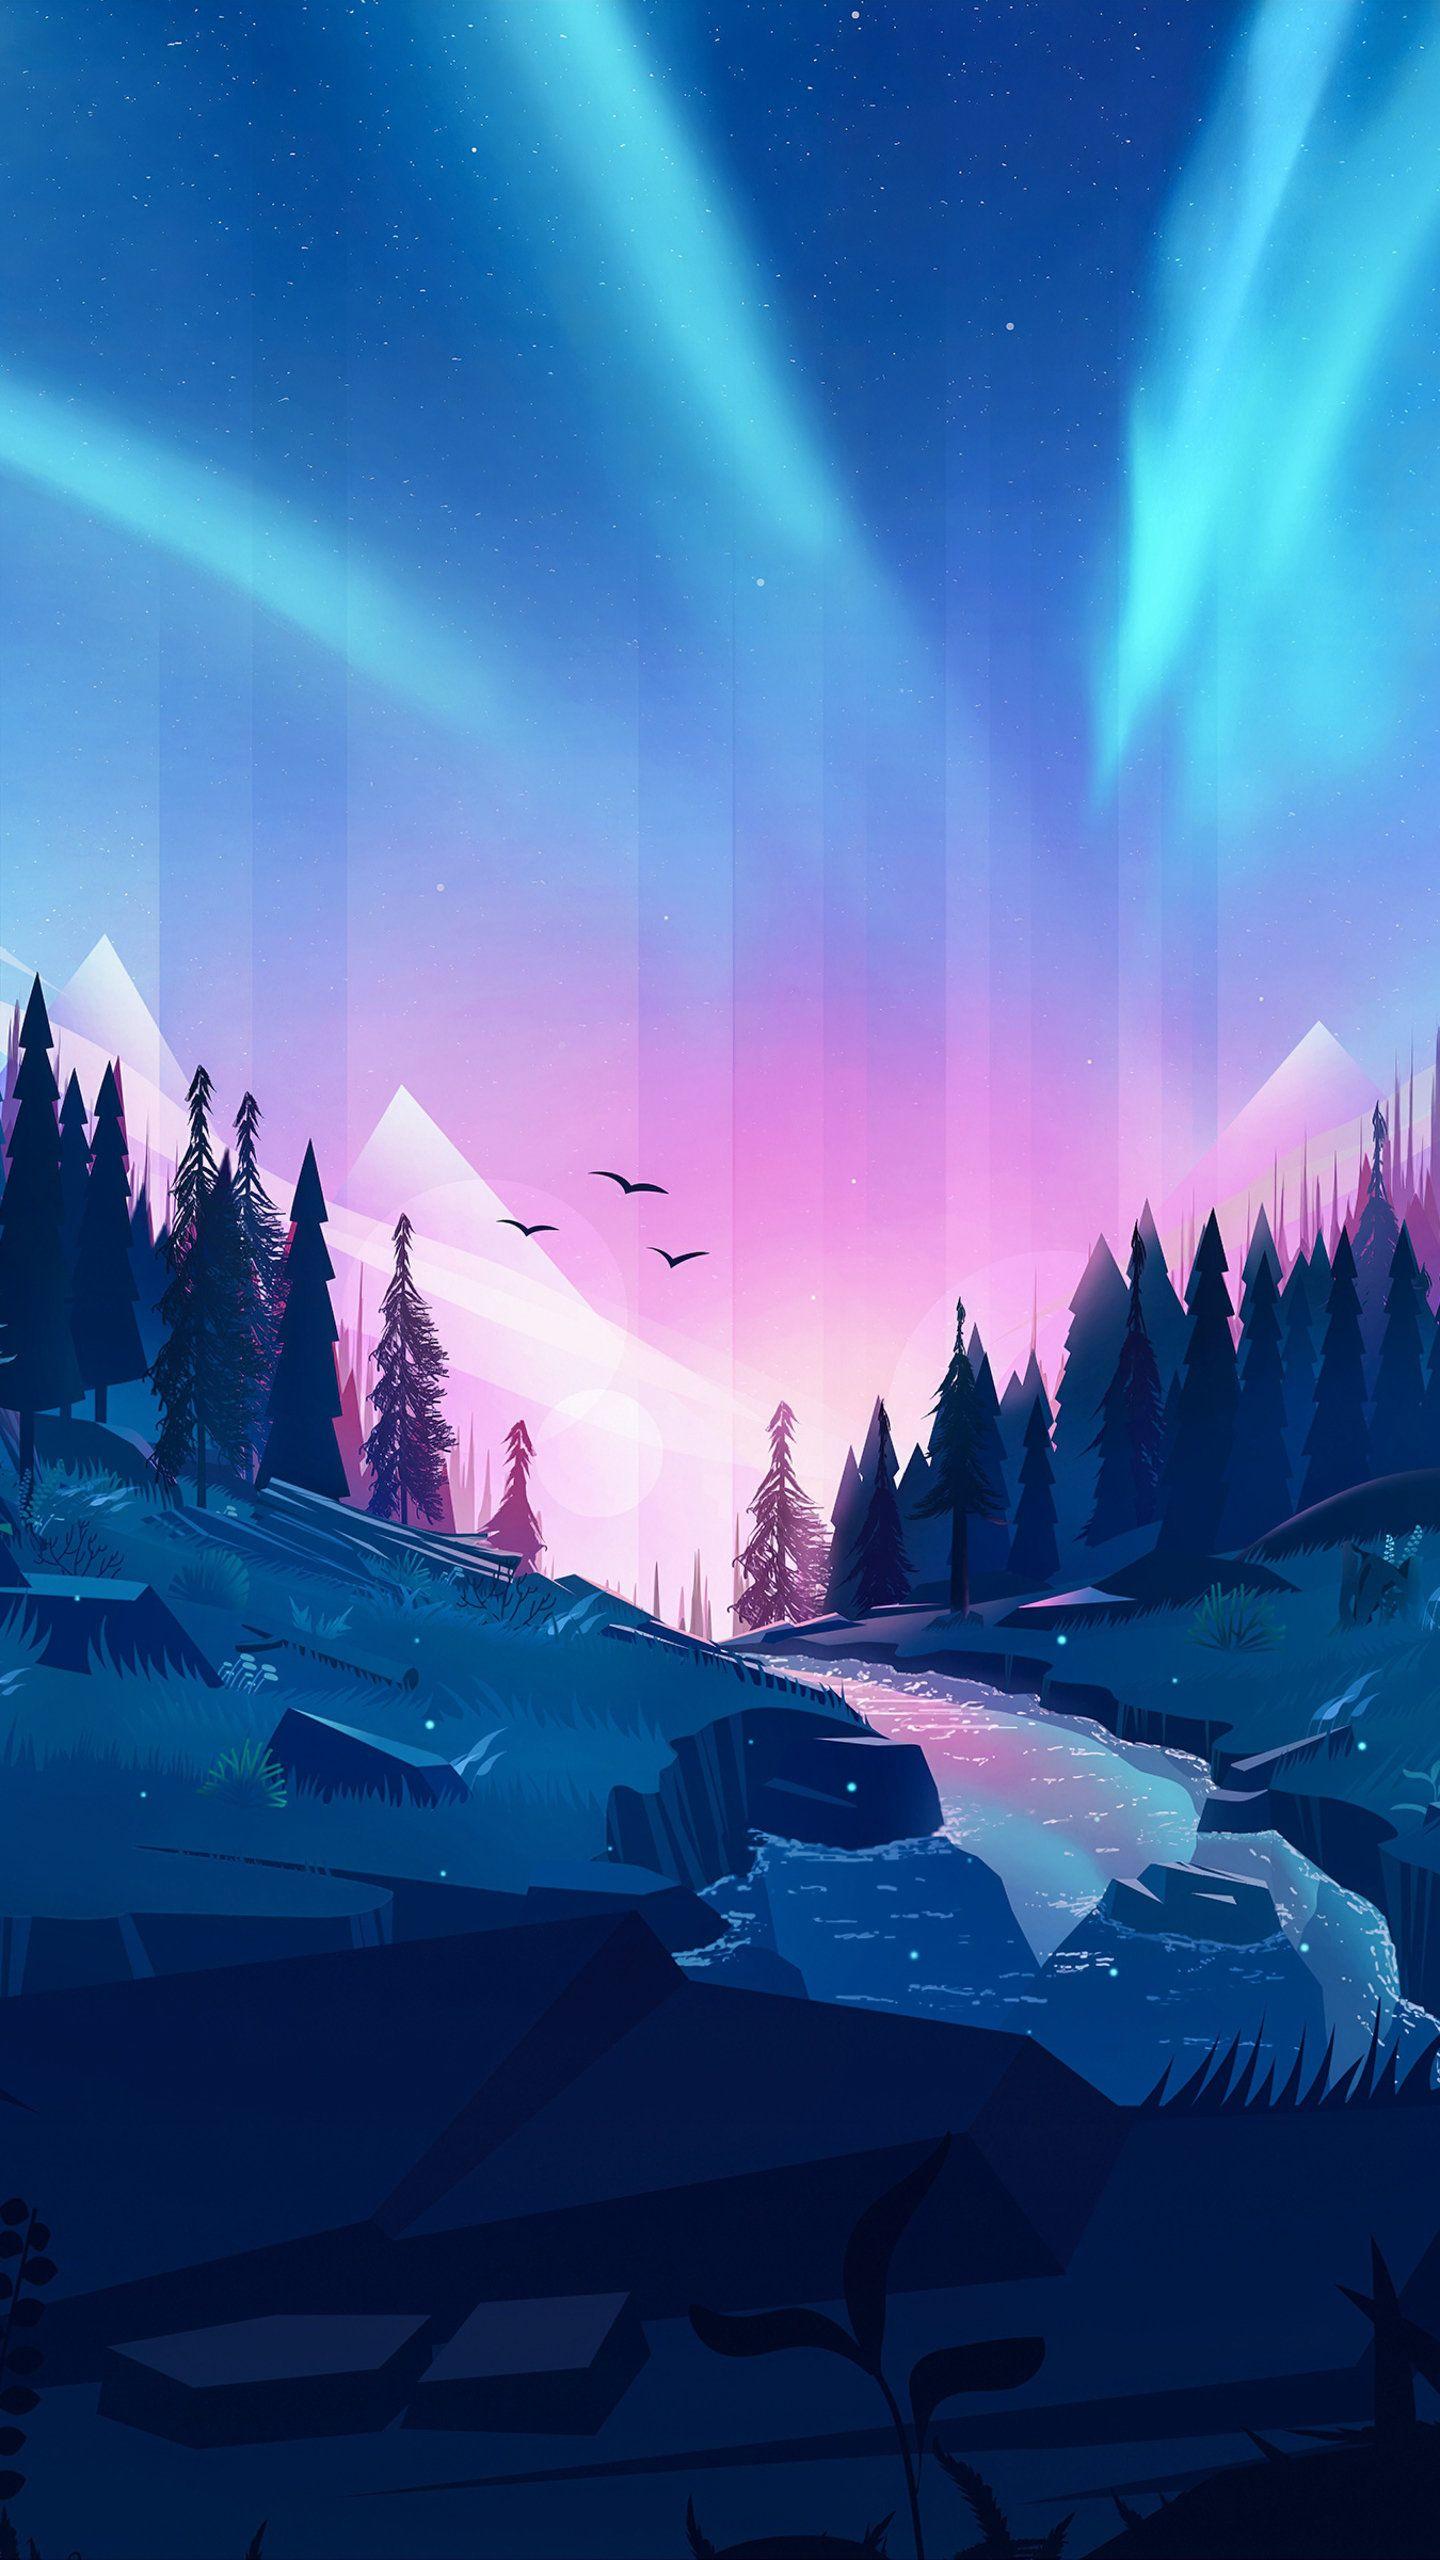 Auroral Forest 4k Illustration Hd Wallpaper Desktop Wallpaper